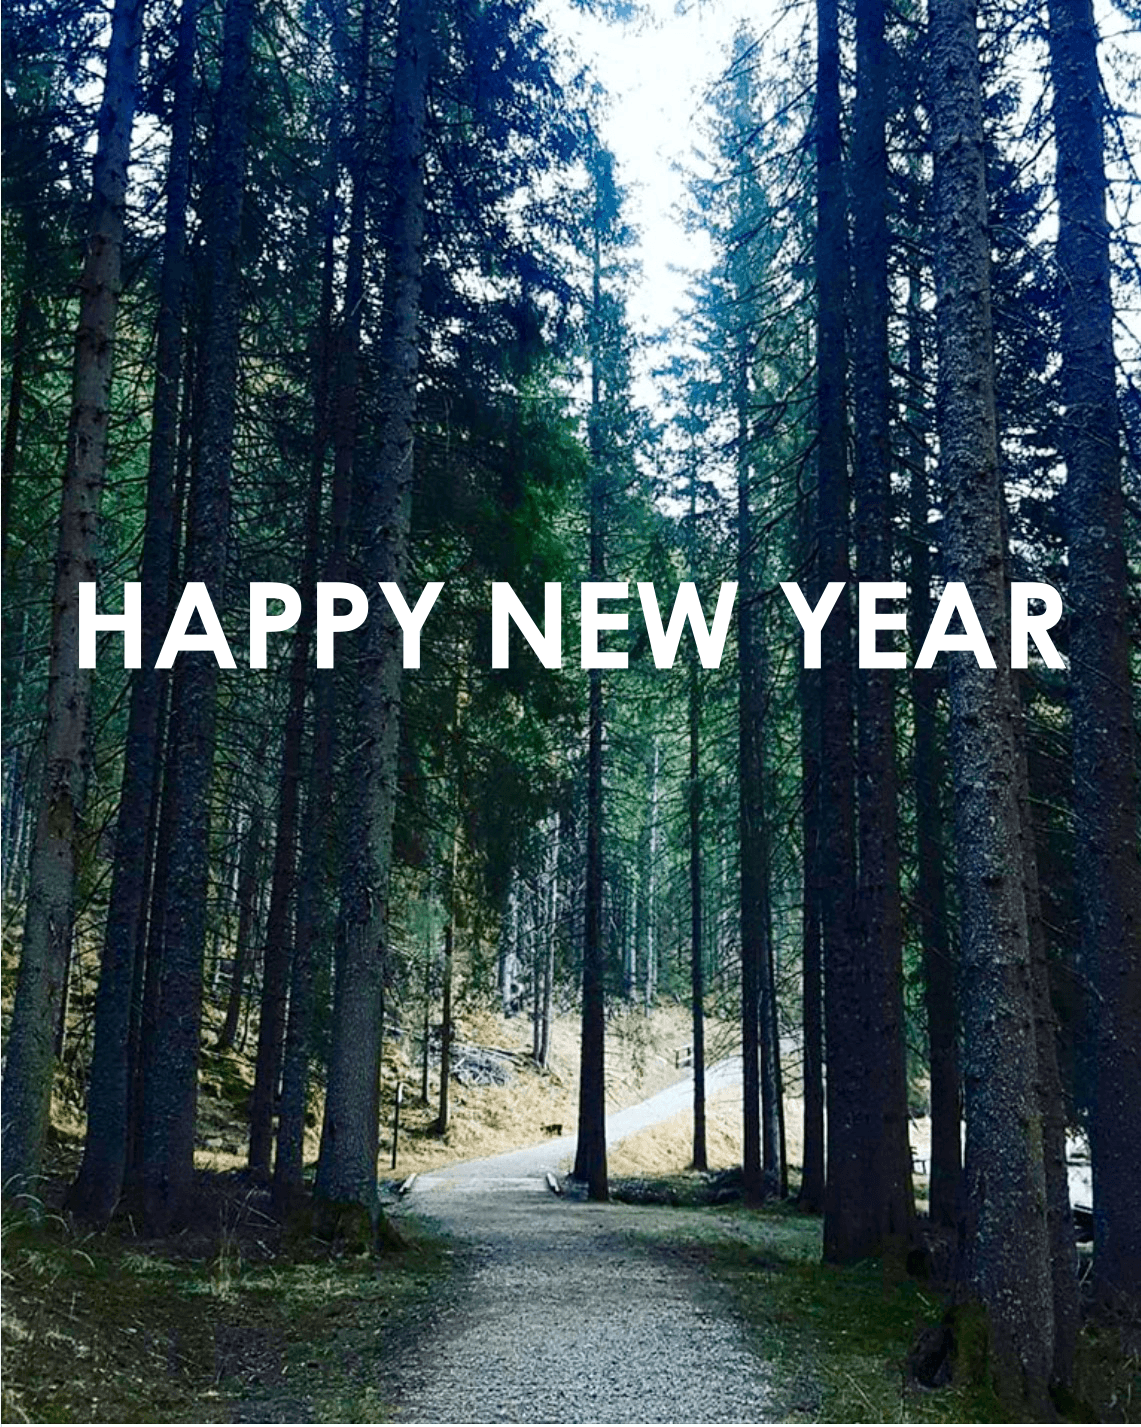 NEW YEAR NEW ADVENTURES